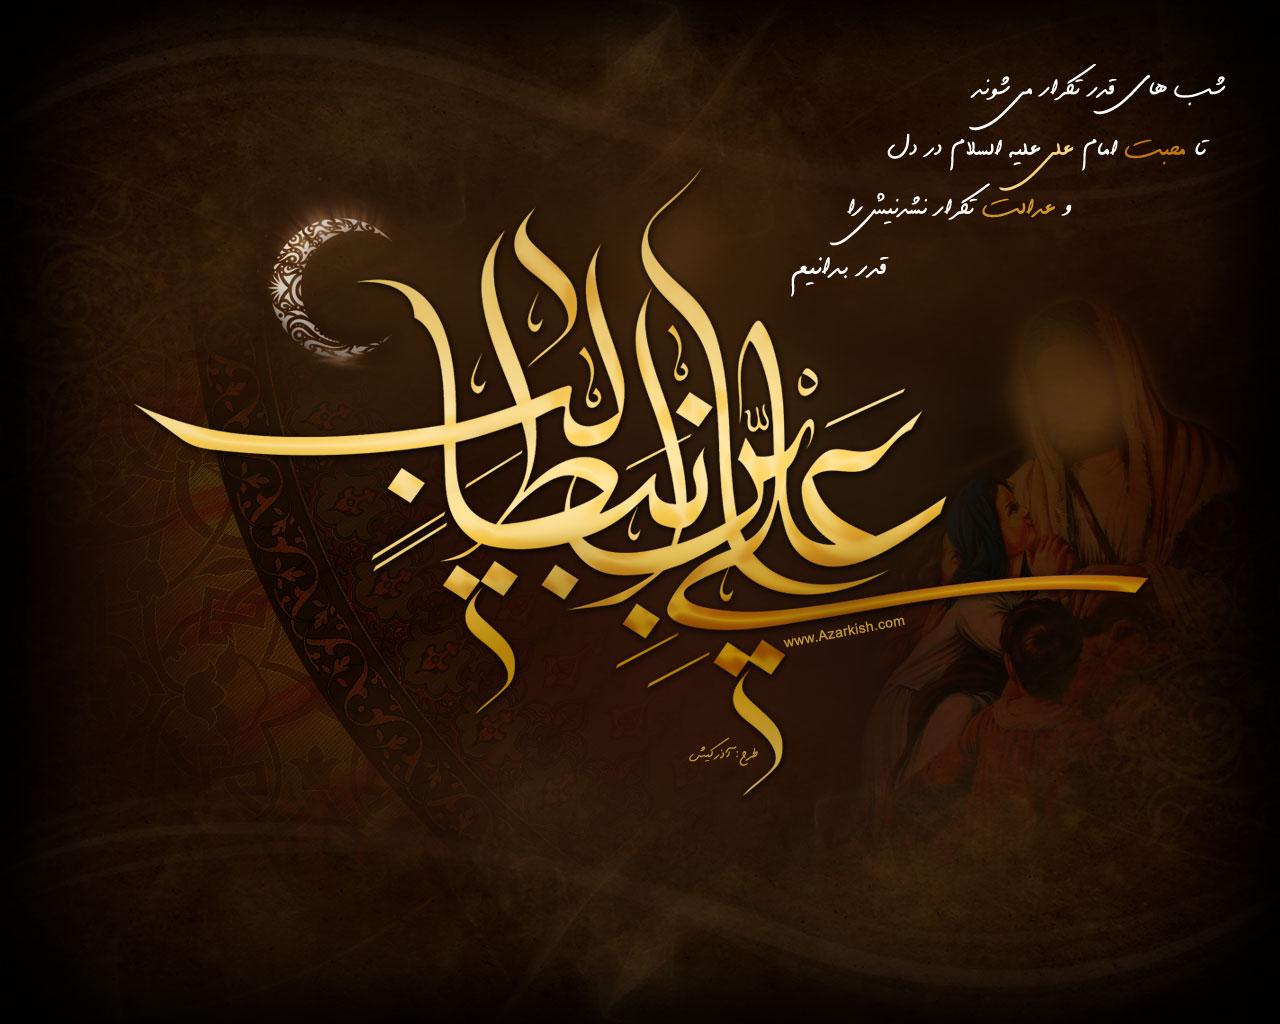 ali_shabe_ghadr